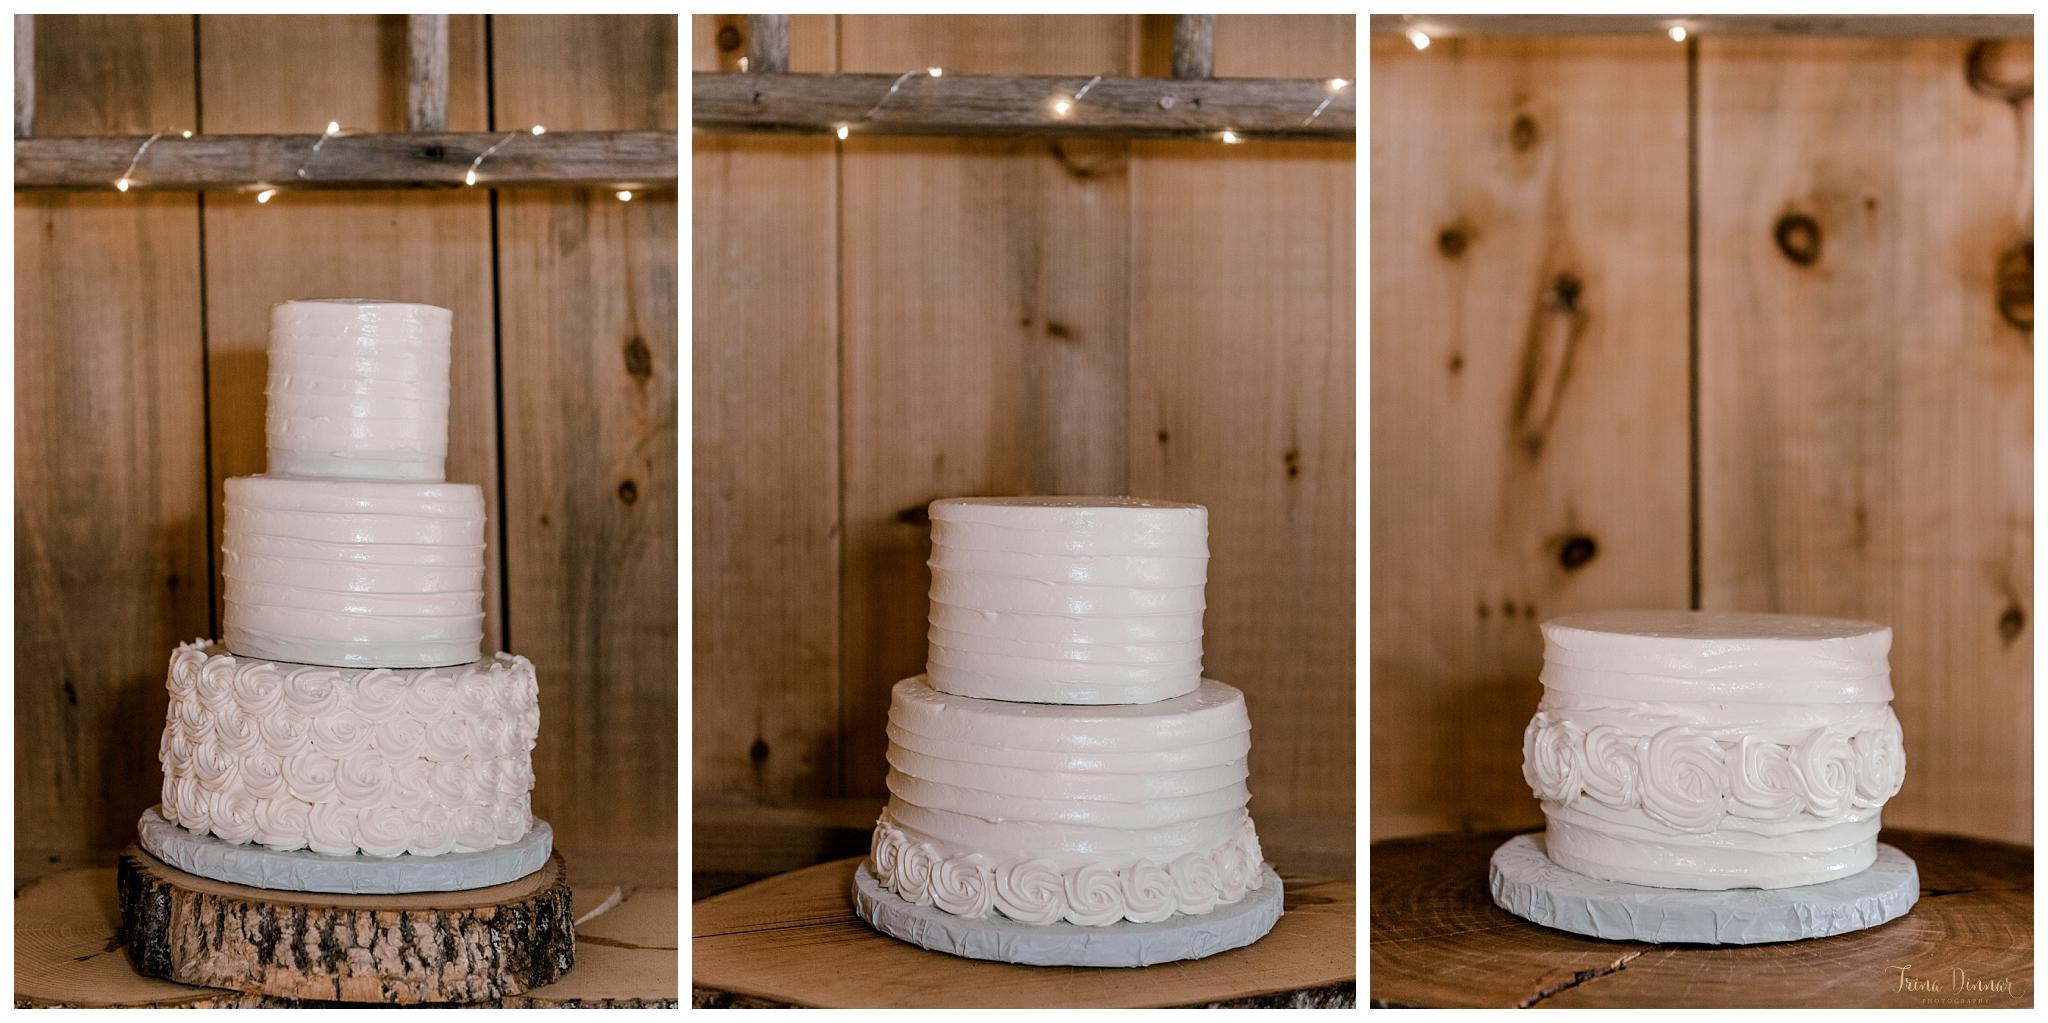 Hippie Chick Bakery Maine Wedding Cakes